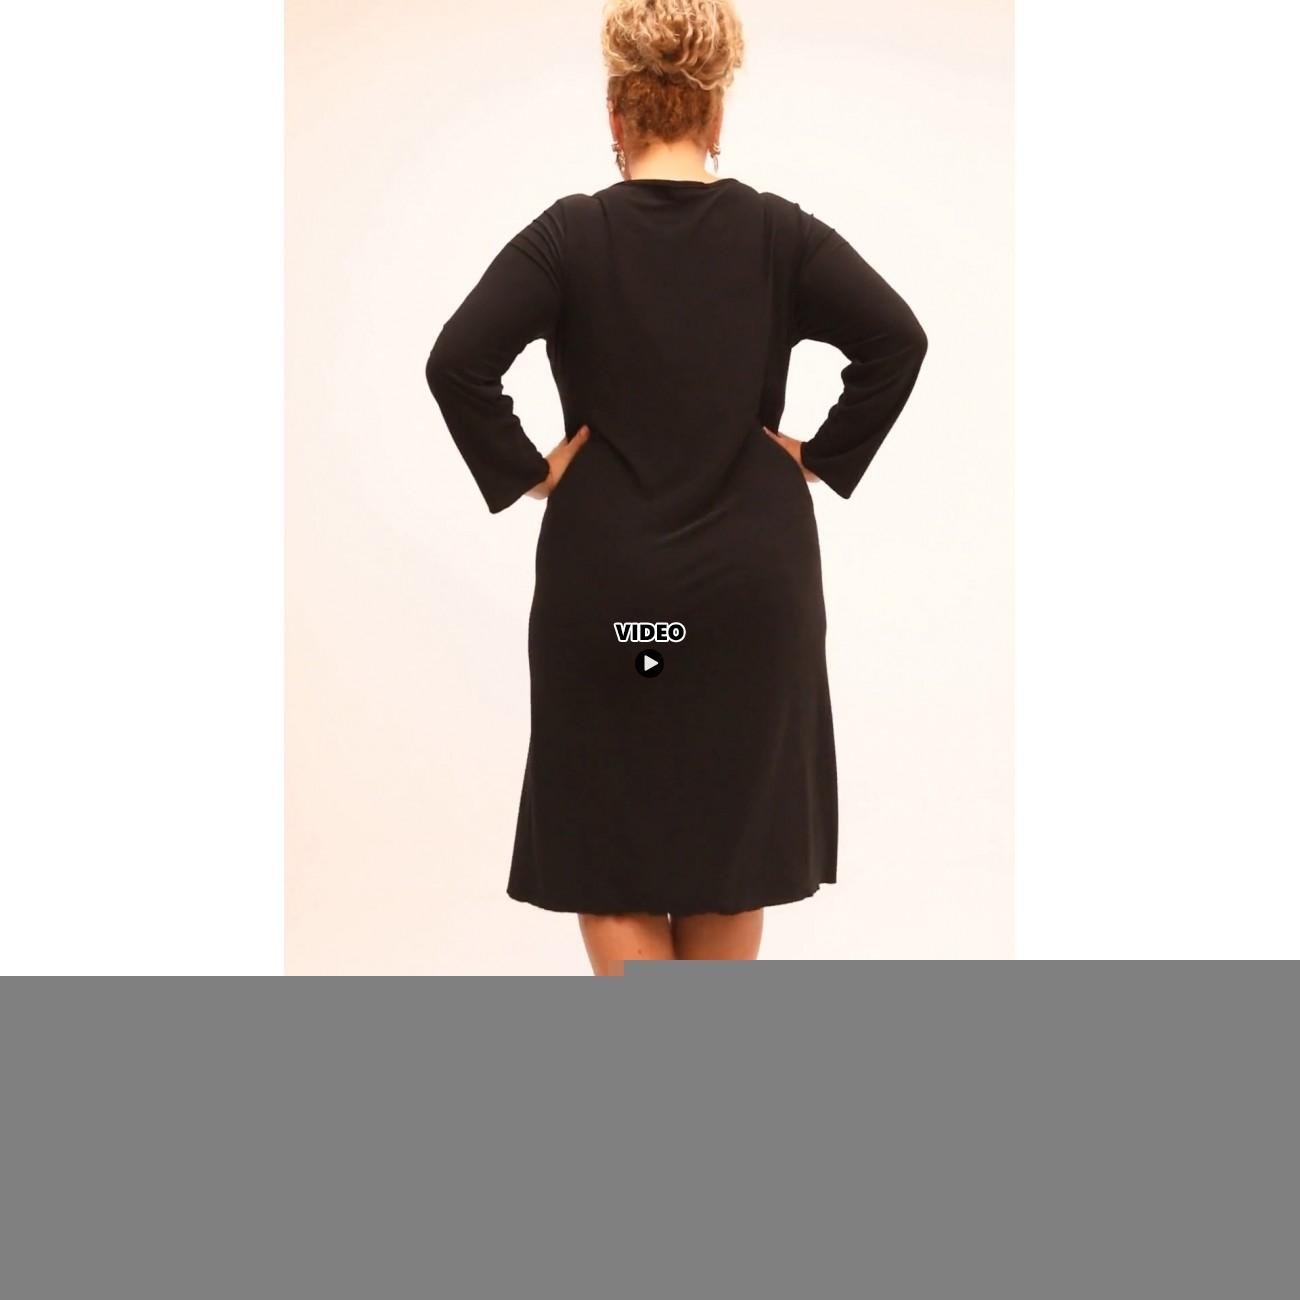 B21-192 Classic dress - Bordeaux